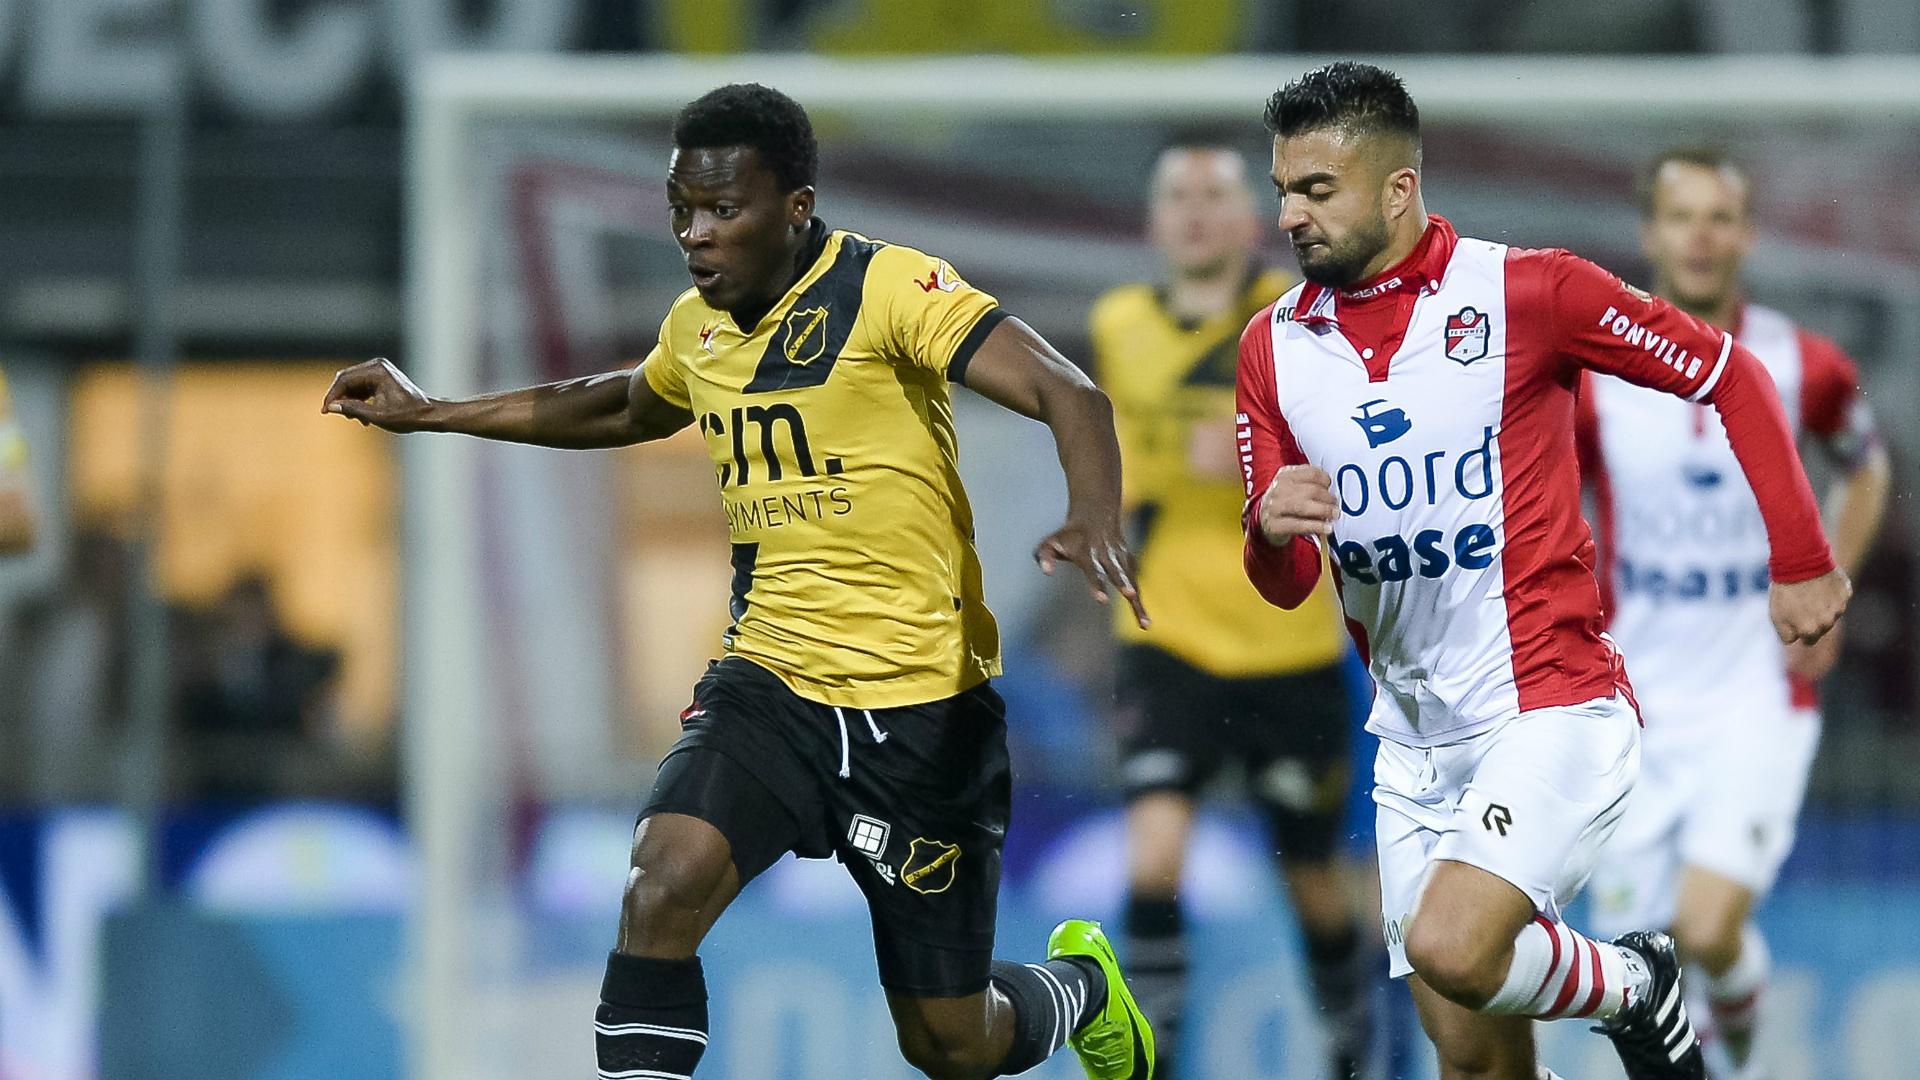 Scottish club Hibernian confirm Thomas Agyepong loan move